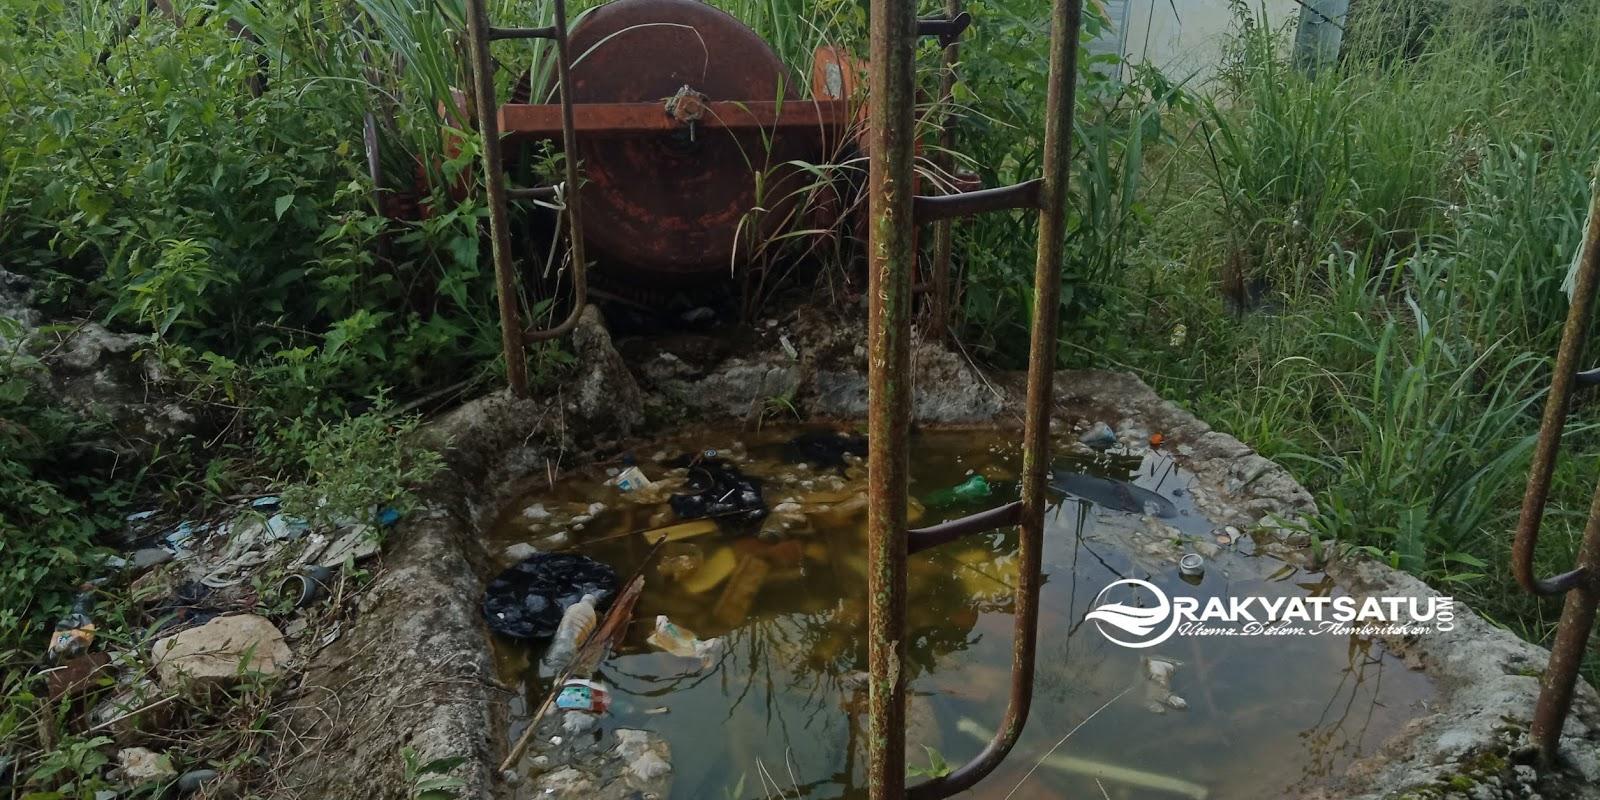 Miris, Begini Kondisi Toilet di Objek Wisata Buntu Singki, Kadis Parawisata Undang Wartawan ke Lokasi